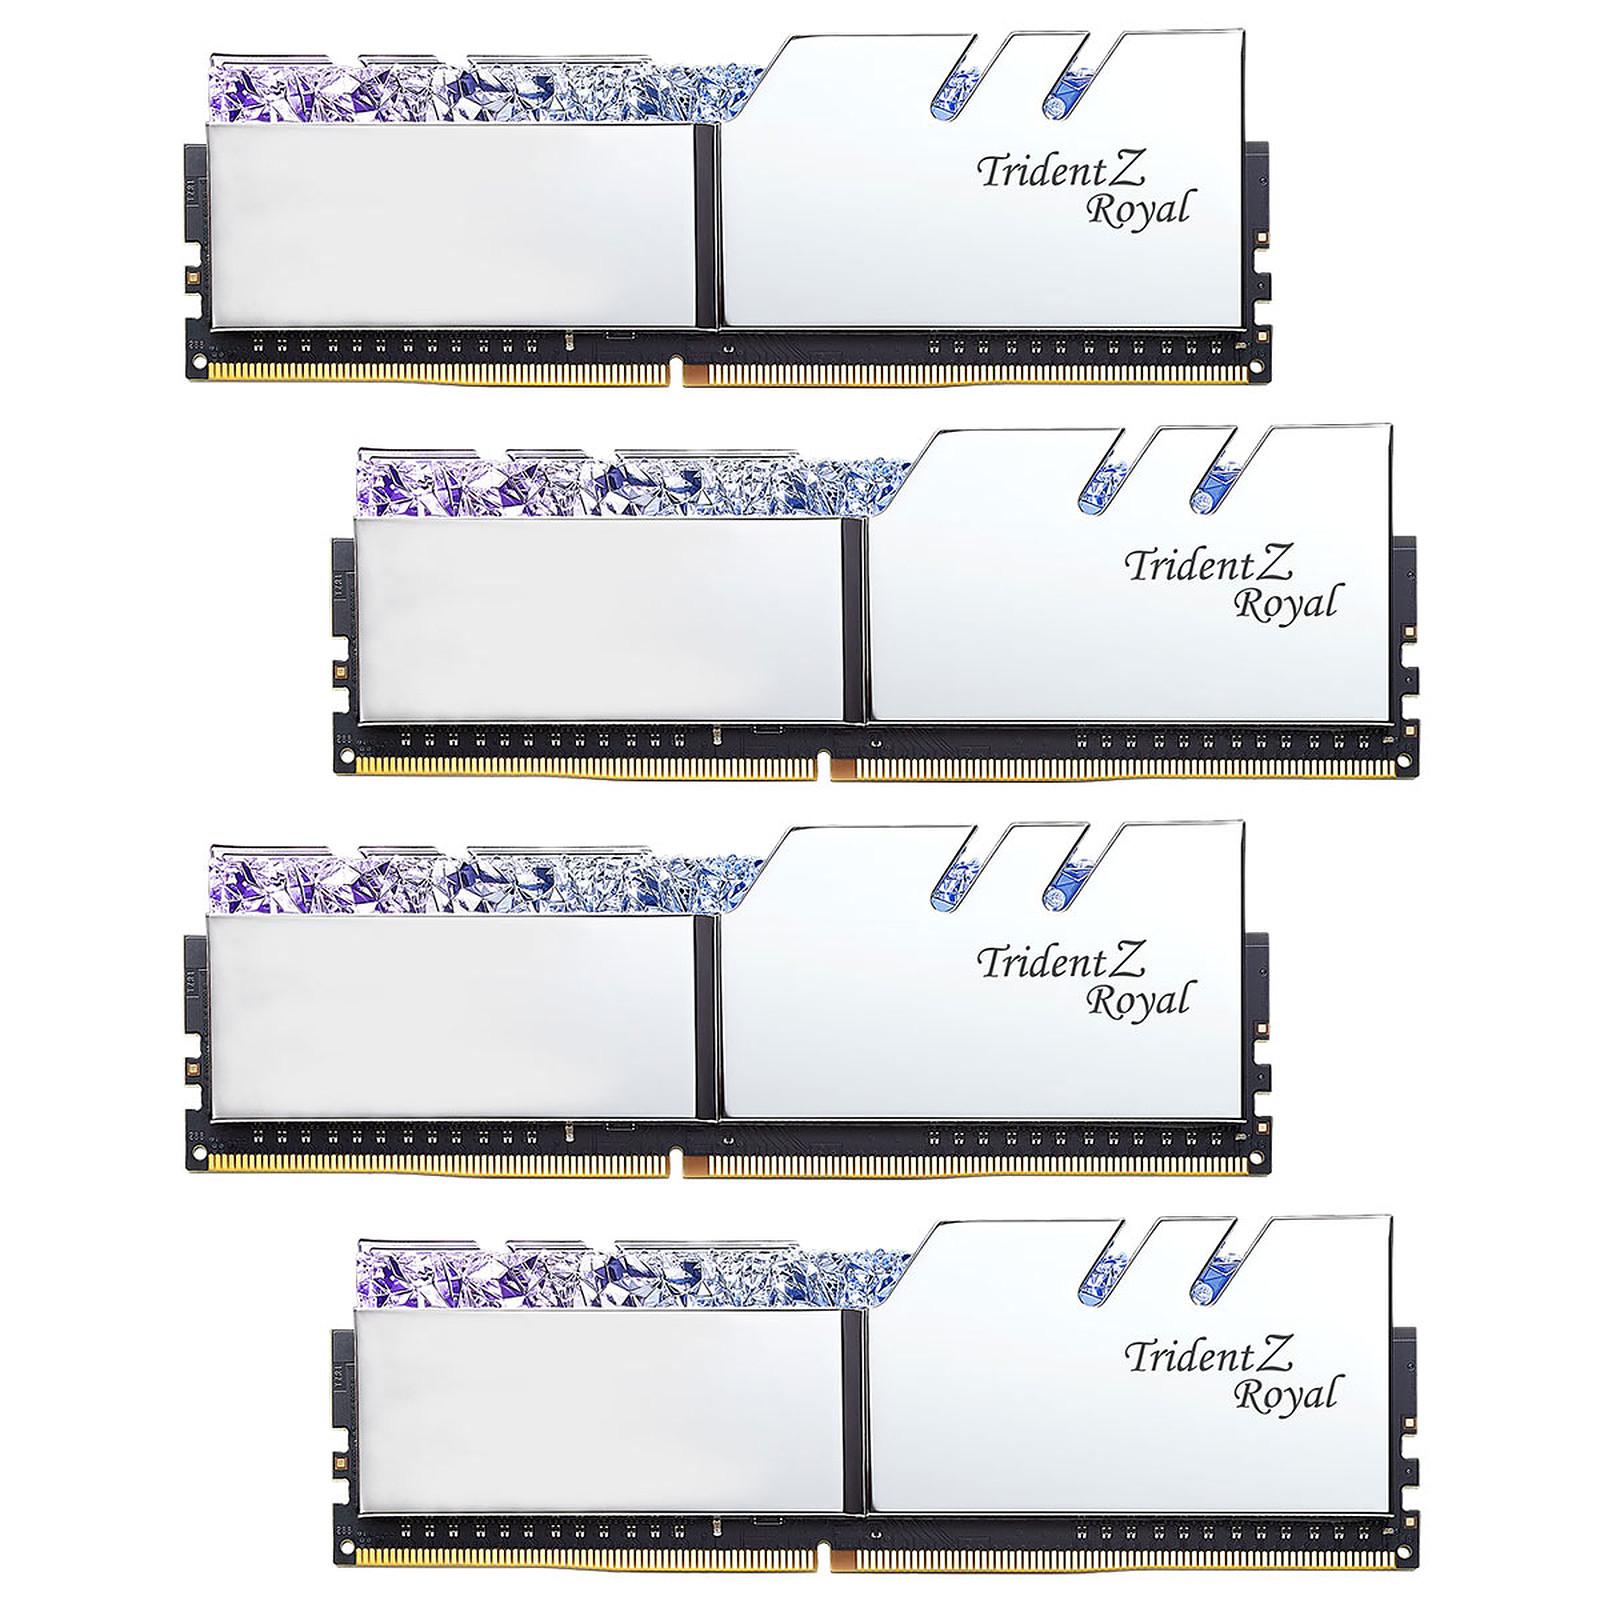 G.Skill Trident Z Royal 64GB (4x 16GB) DDR4 3000 MHz CL16 - Plata